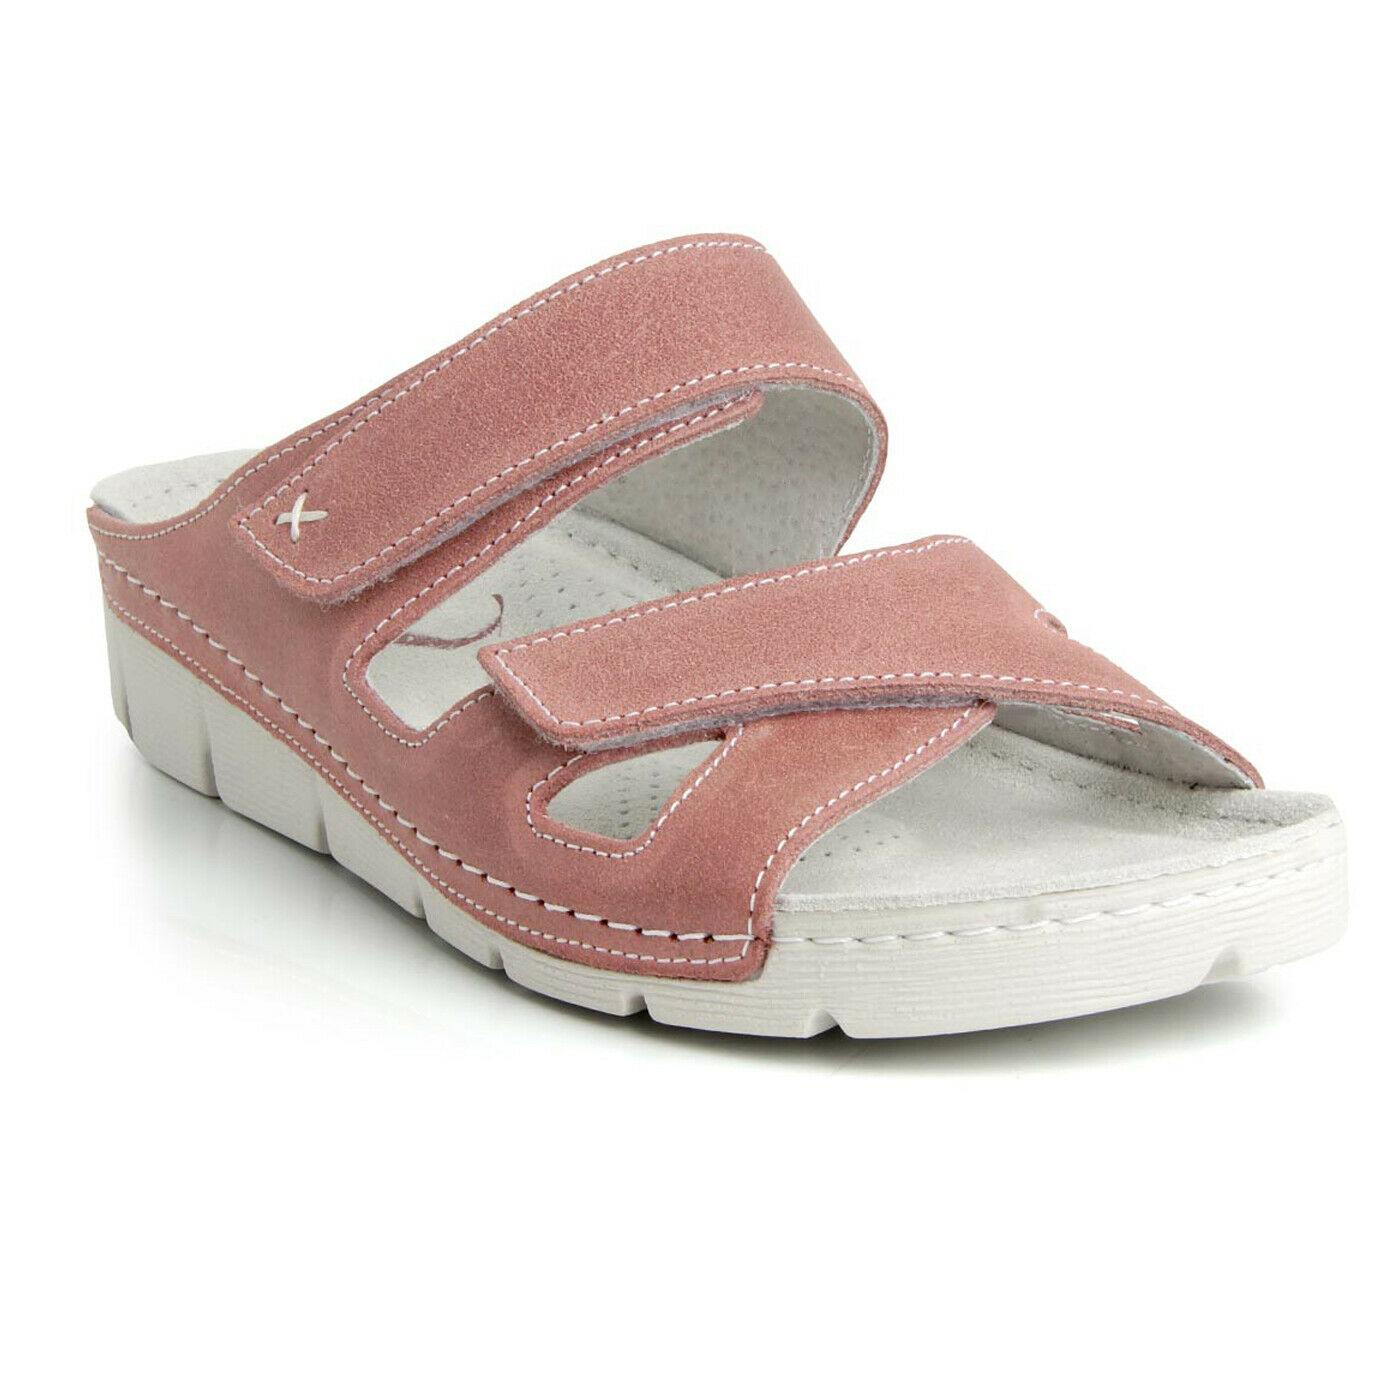 Batz EMILIA purple Top Quality Handmade Leather Sandals Clogs Mules Mules Mules Women UK New 39283f